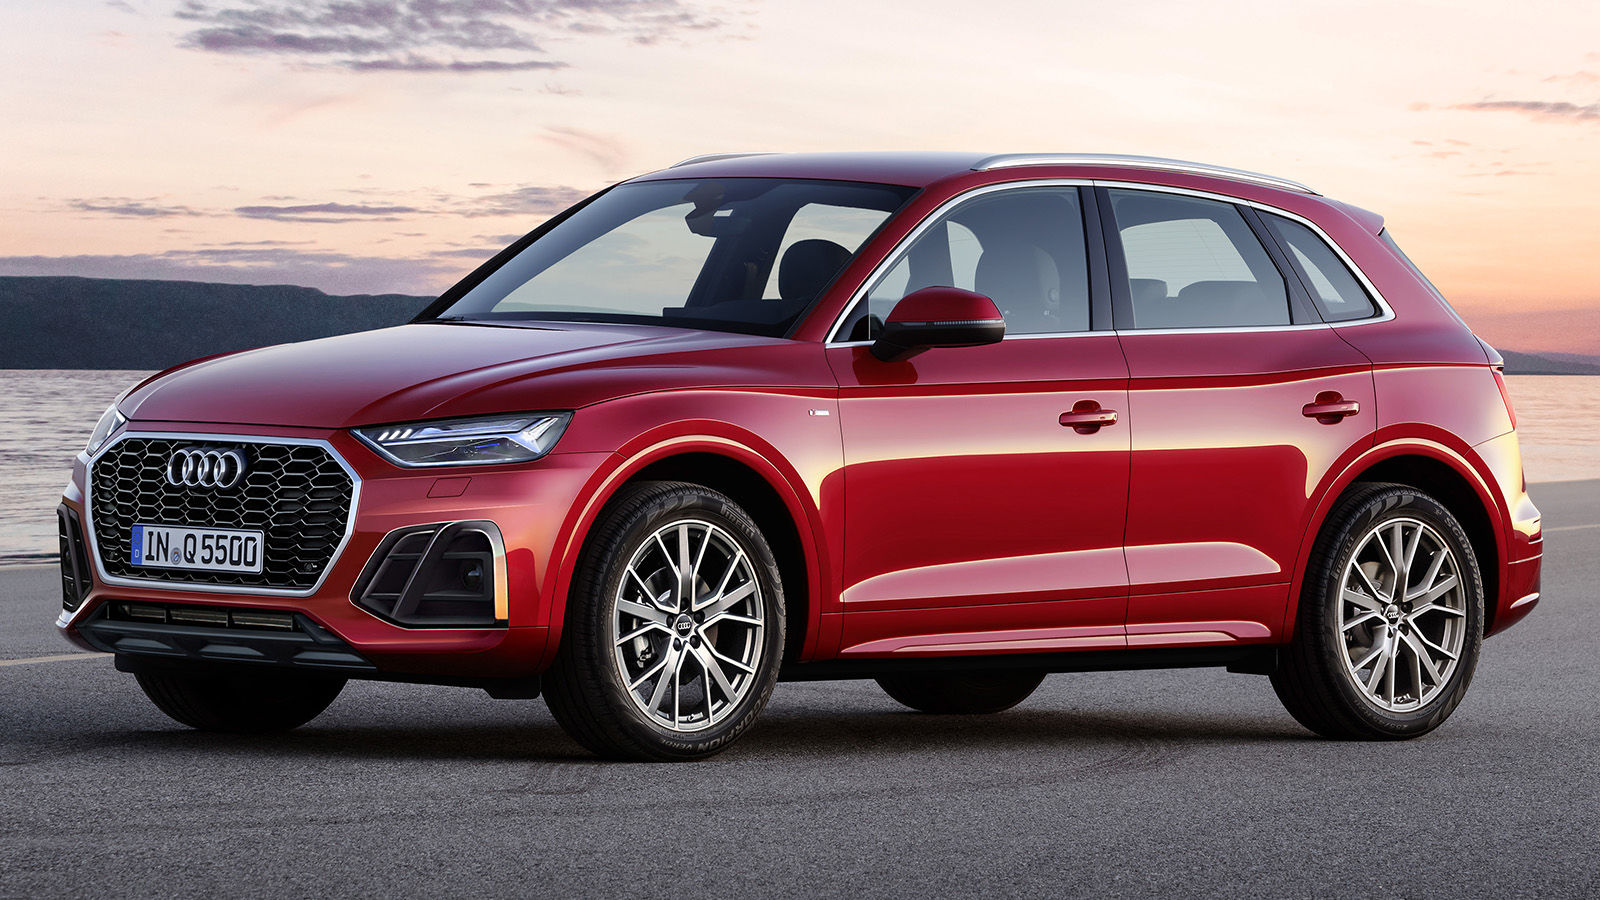 Audi Q5 Facelift 2020 Neuvorstellung Skizze Suv Infos Auto Bild